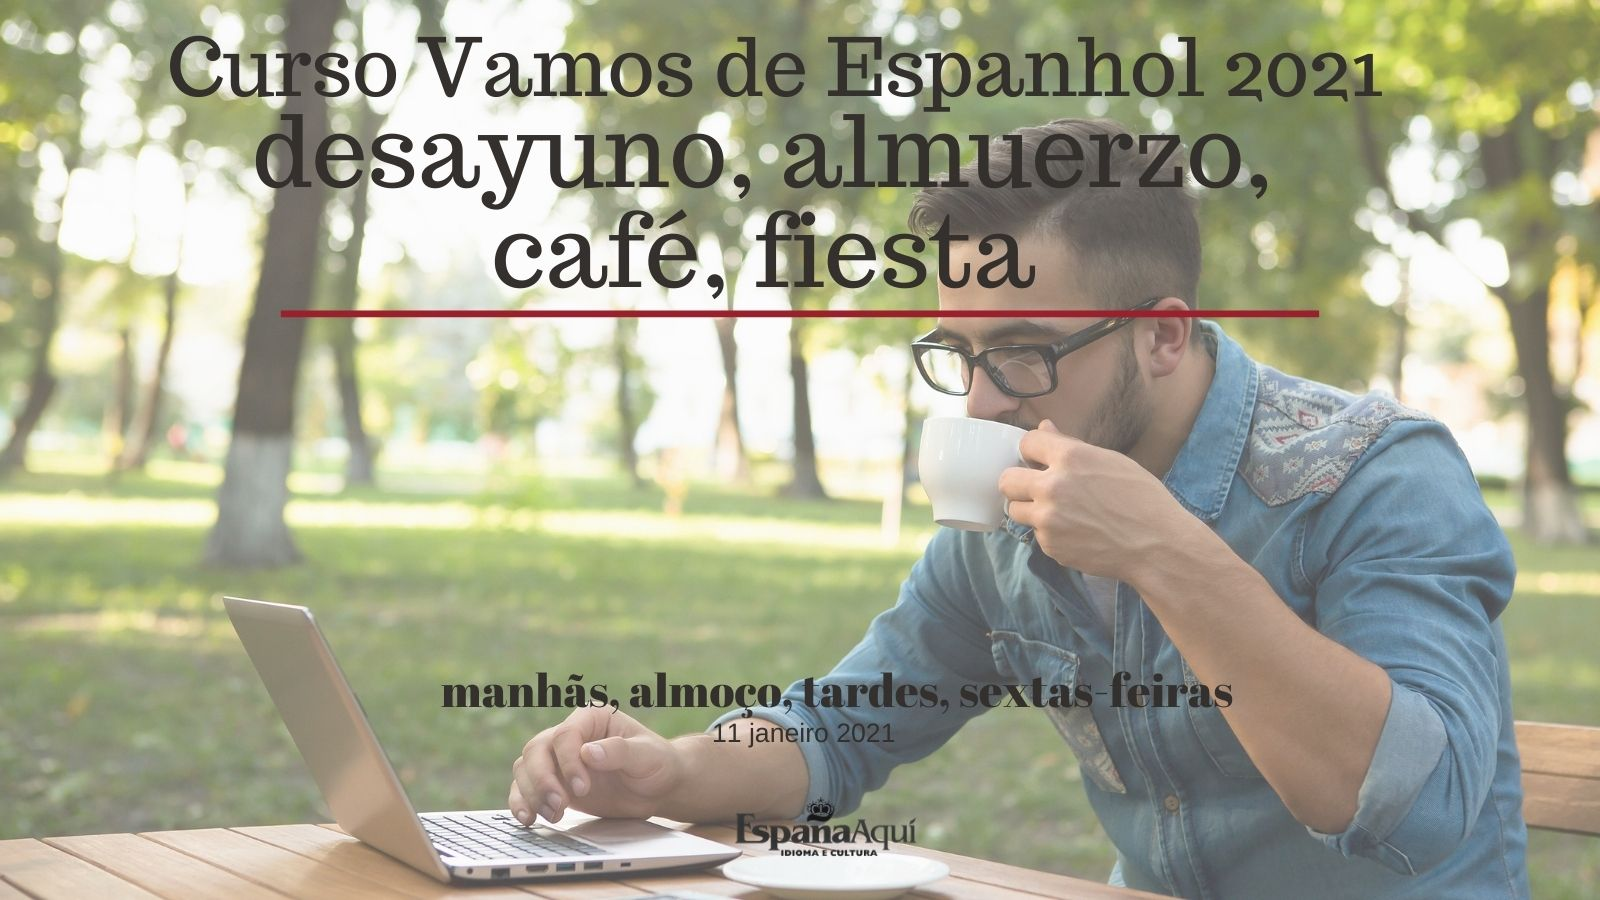 https://www.espanaaqui.com.br/pdf/fevereiro%202021/priorit%c3%a1rio%20twitter%20desayuno....jpg